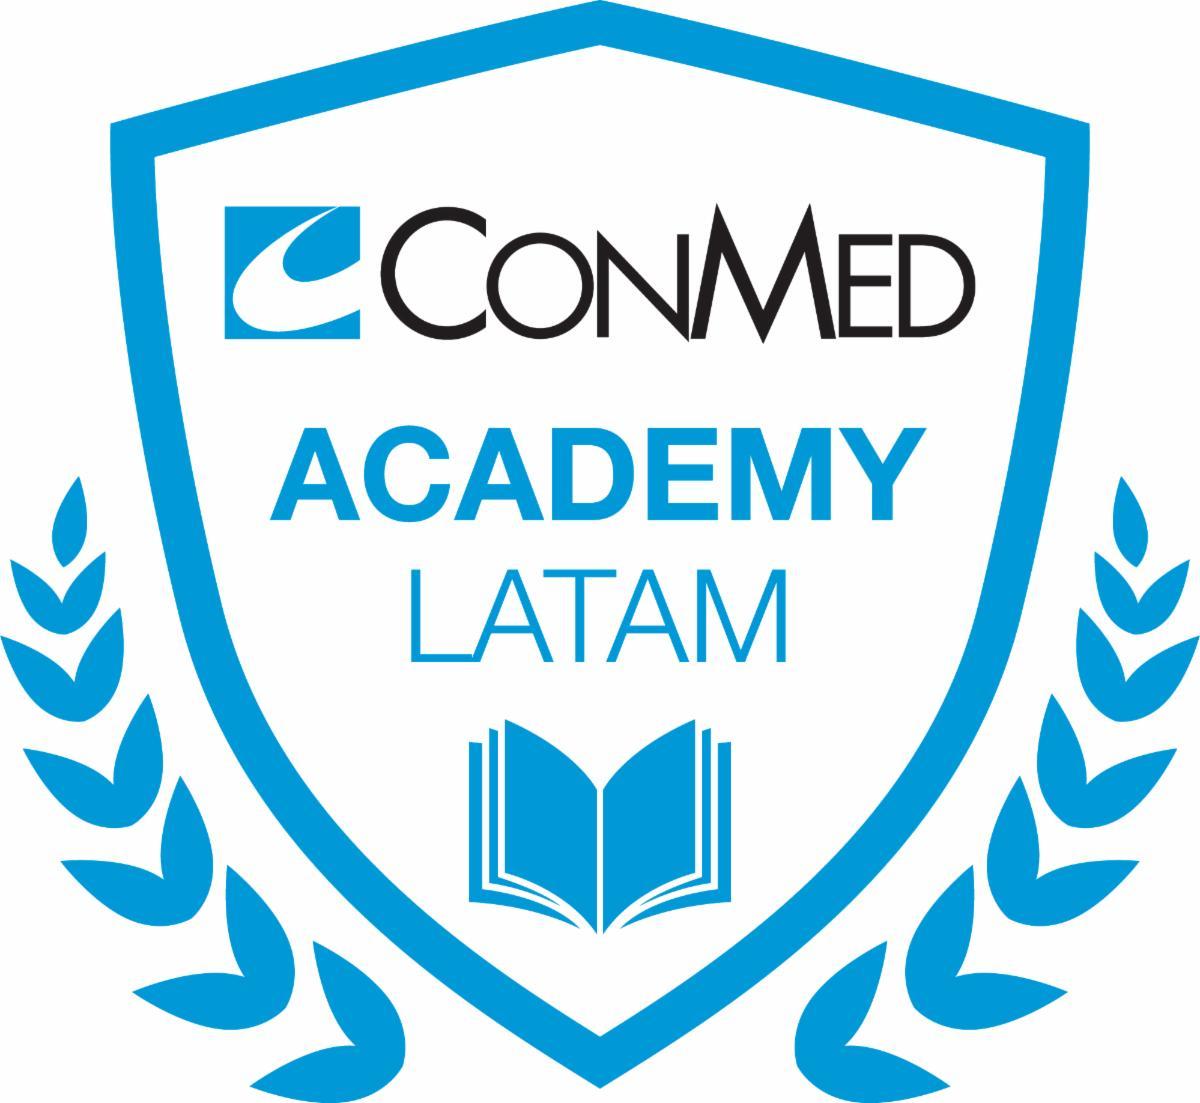 CONMED Academy LATAM Logo.jpg